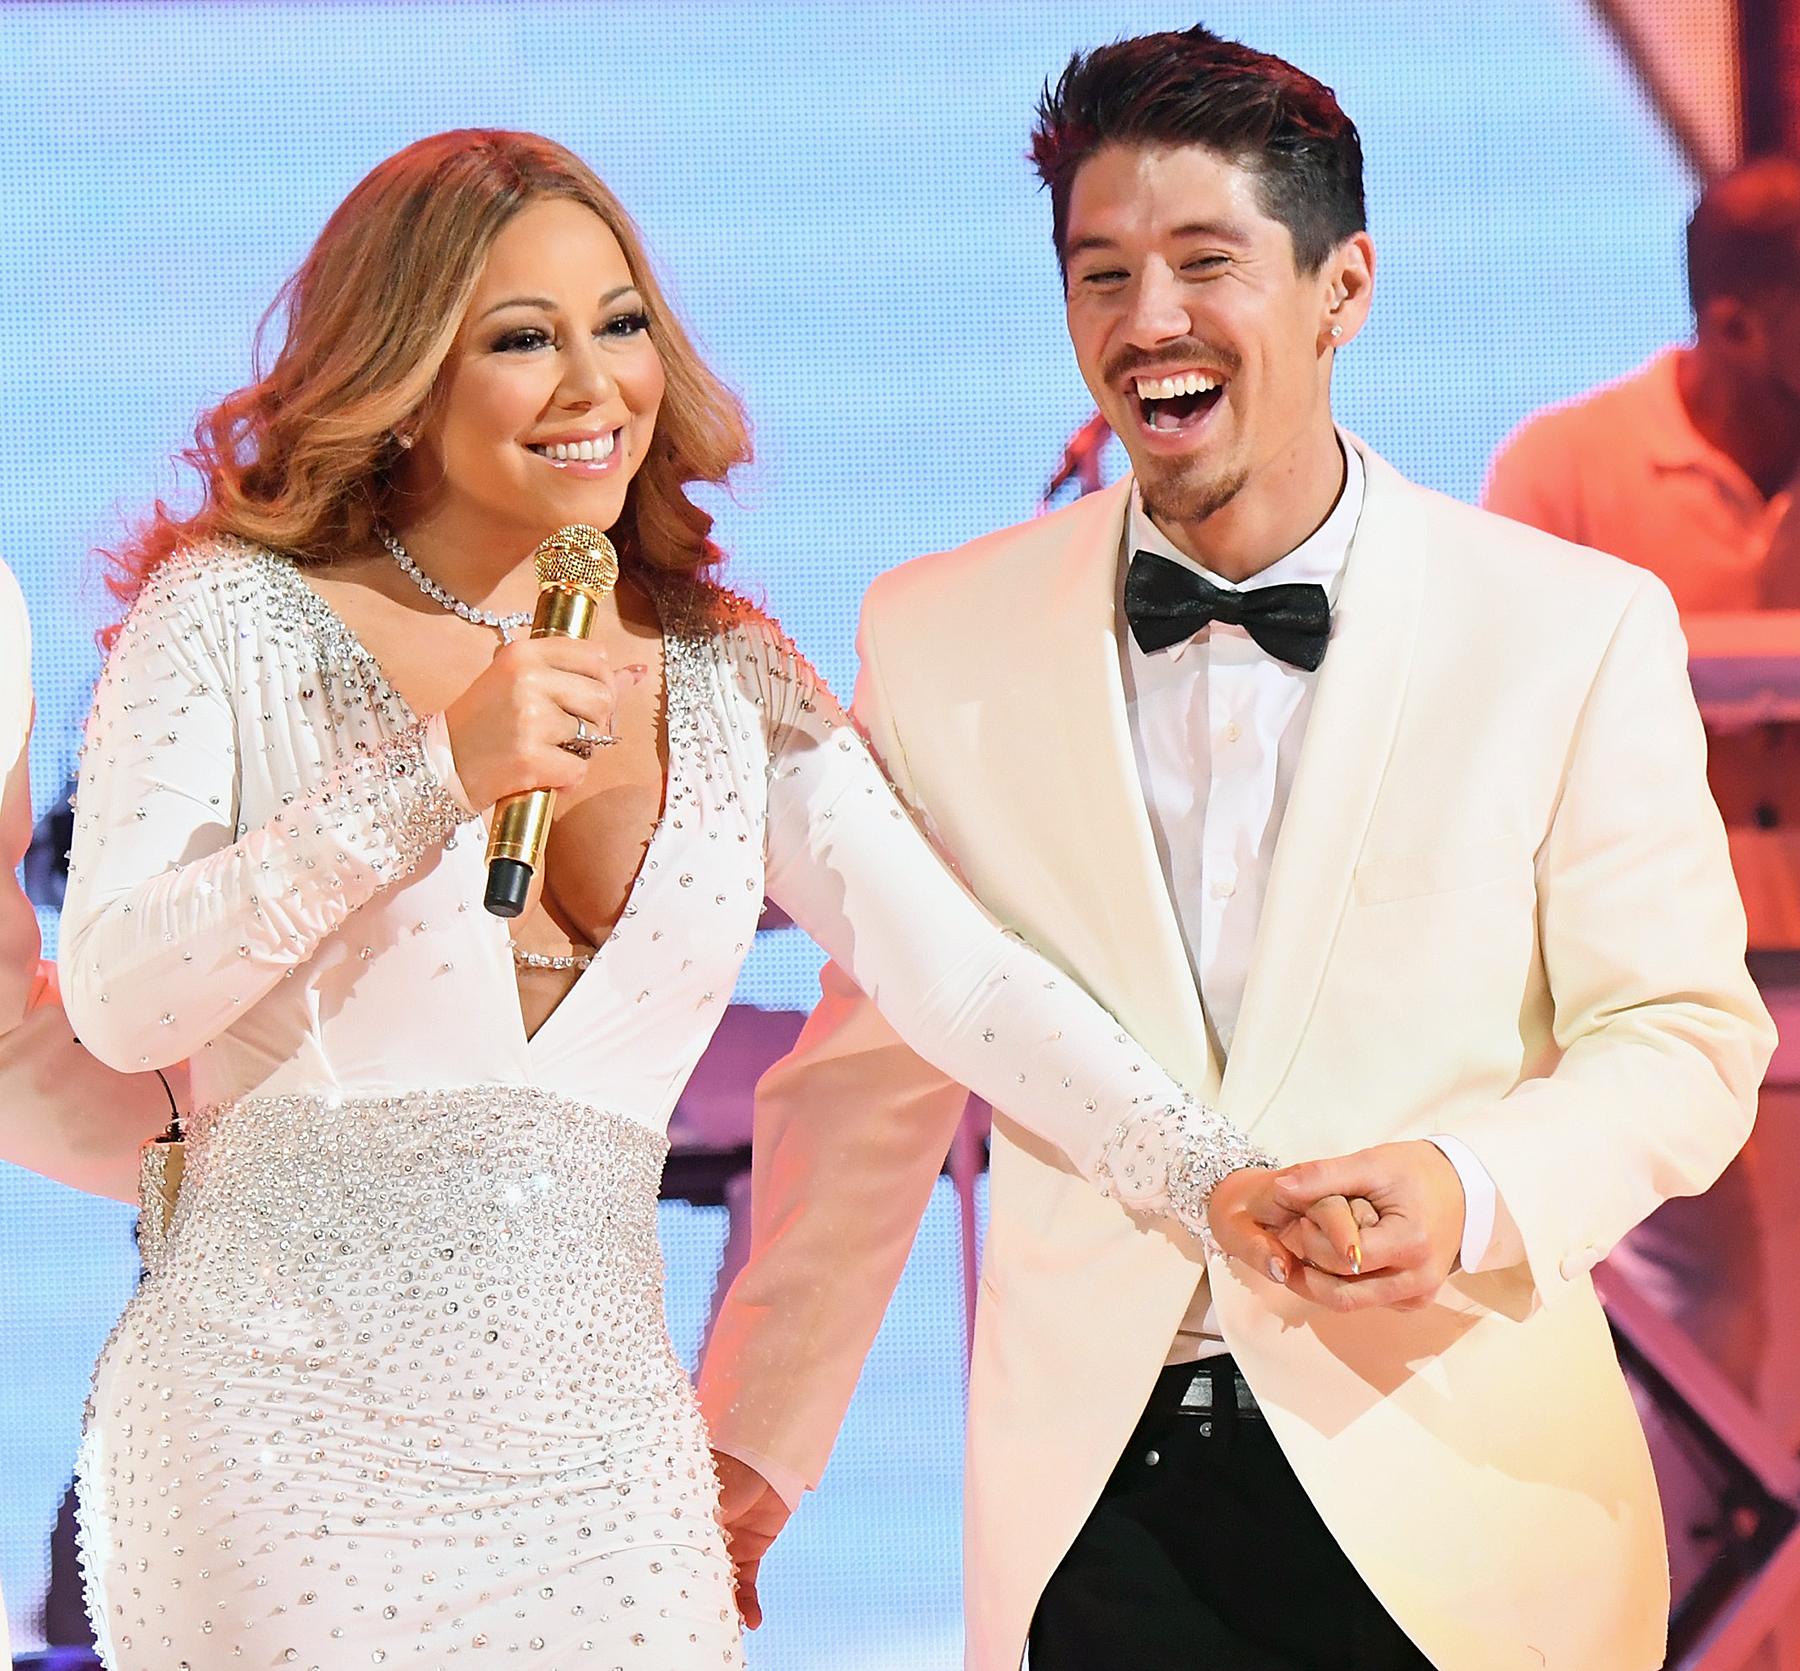 Mariah Carey Bryan Tanaka. Mariah Carey and Bryan Tanaka  The Way They Were